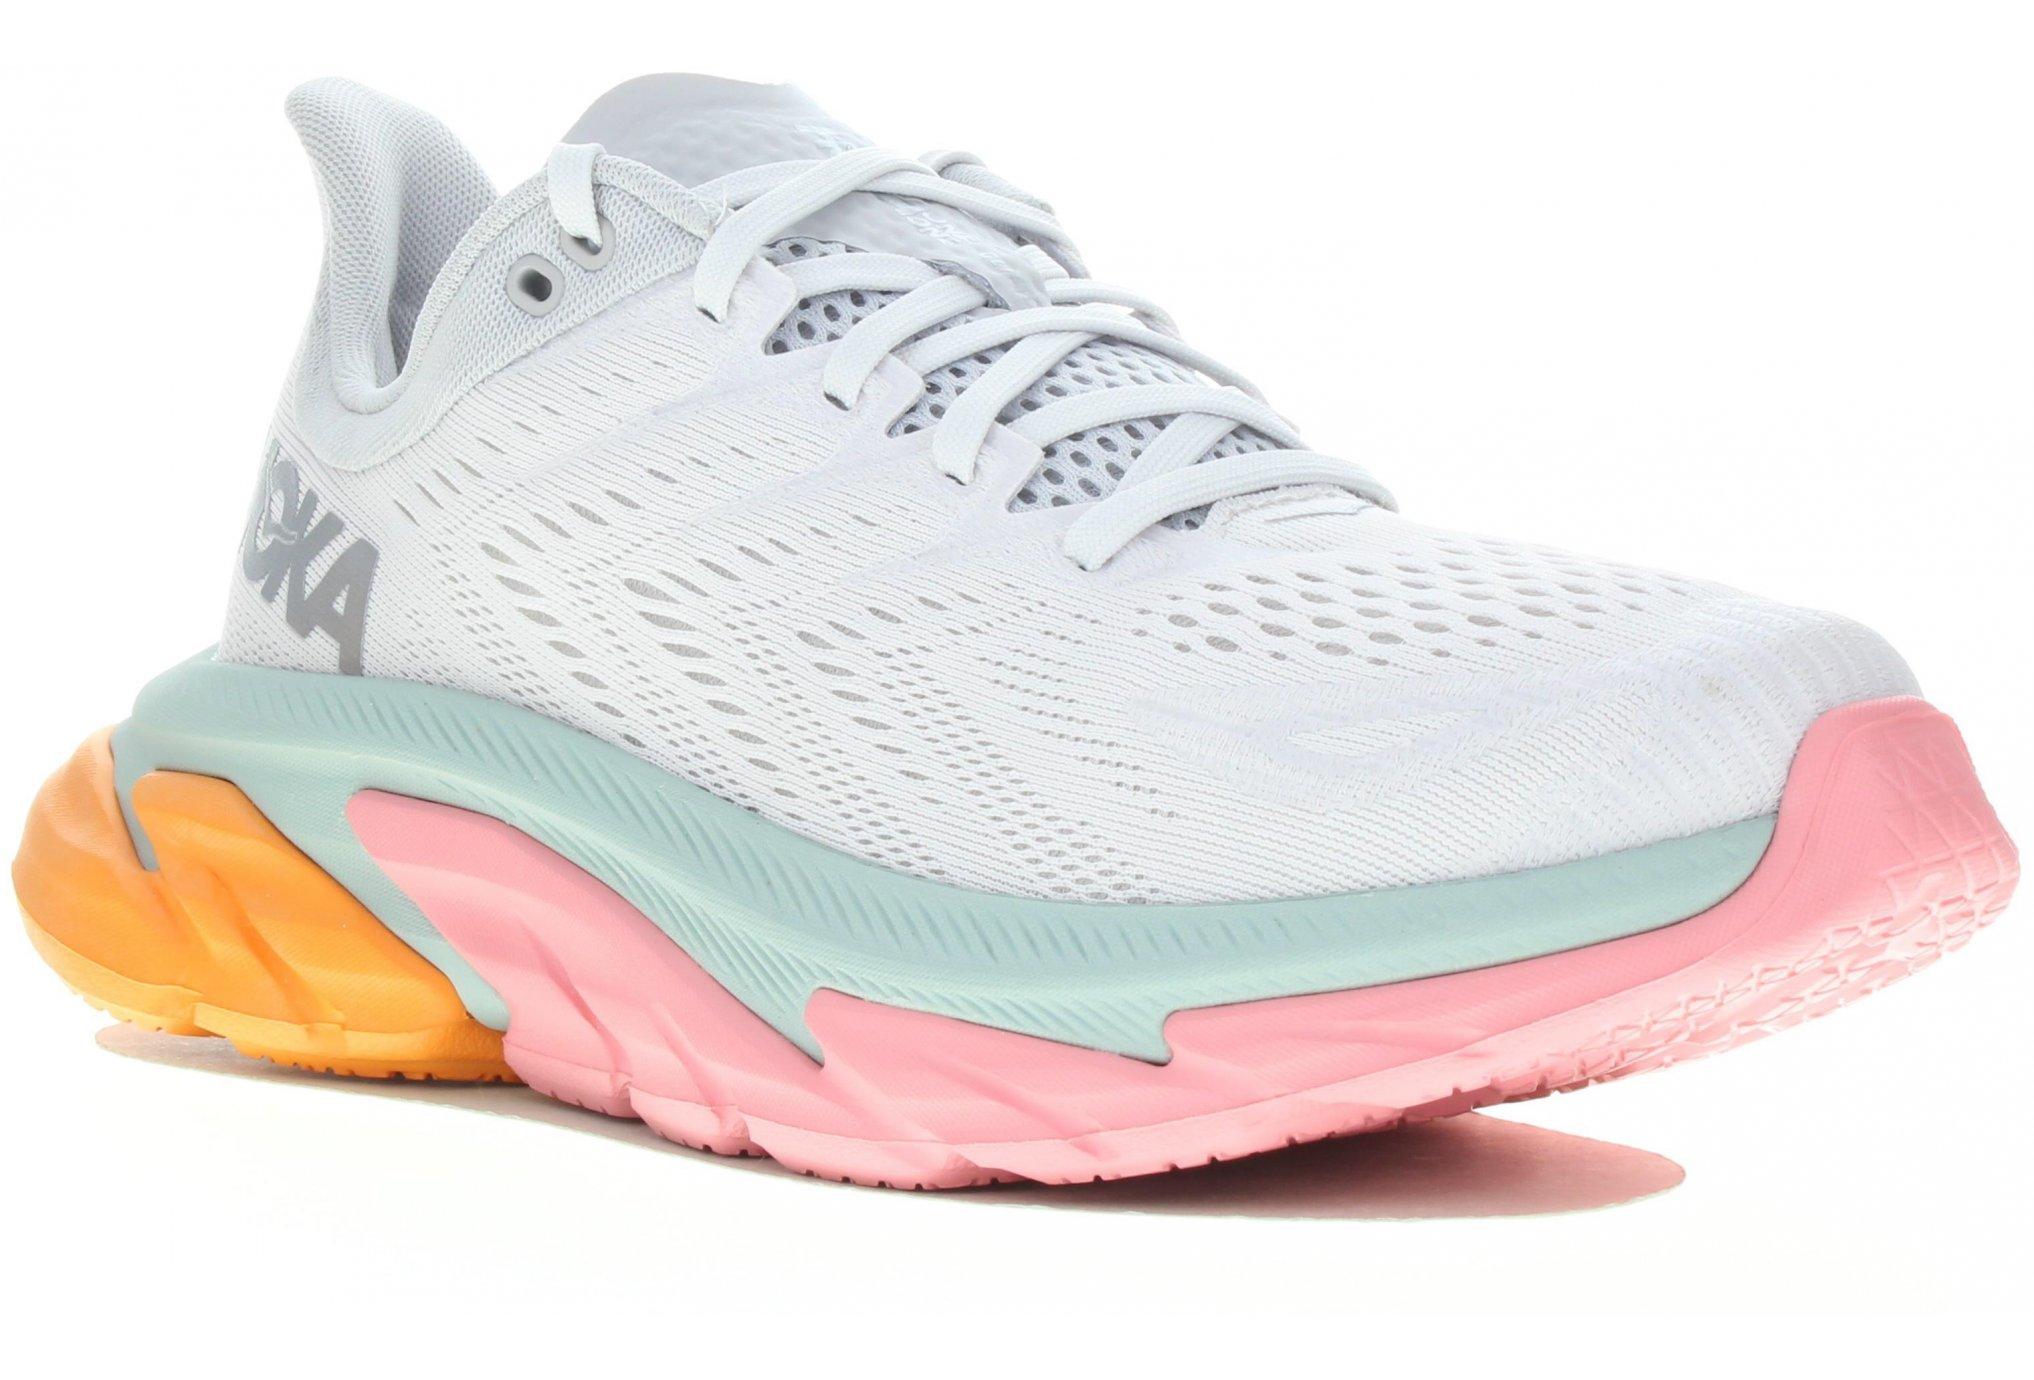 Hoka One One Clifton Edge Chaussures running femme